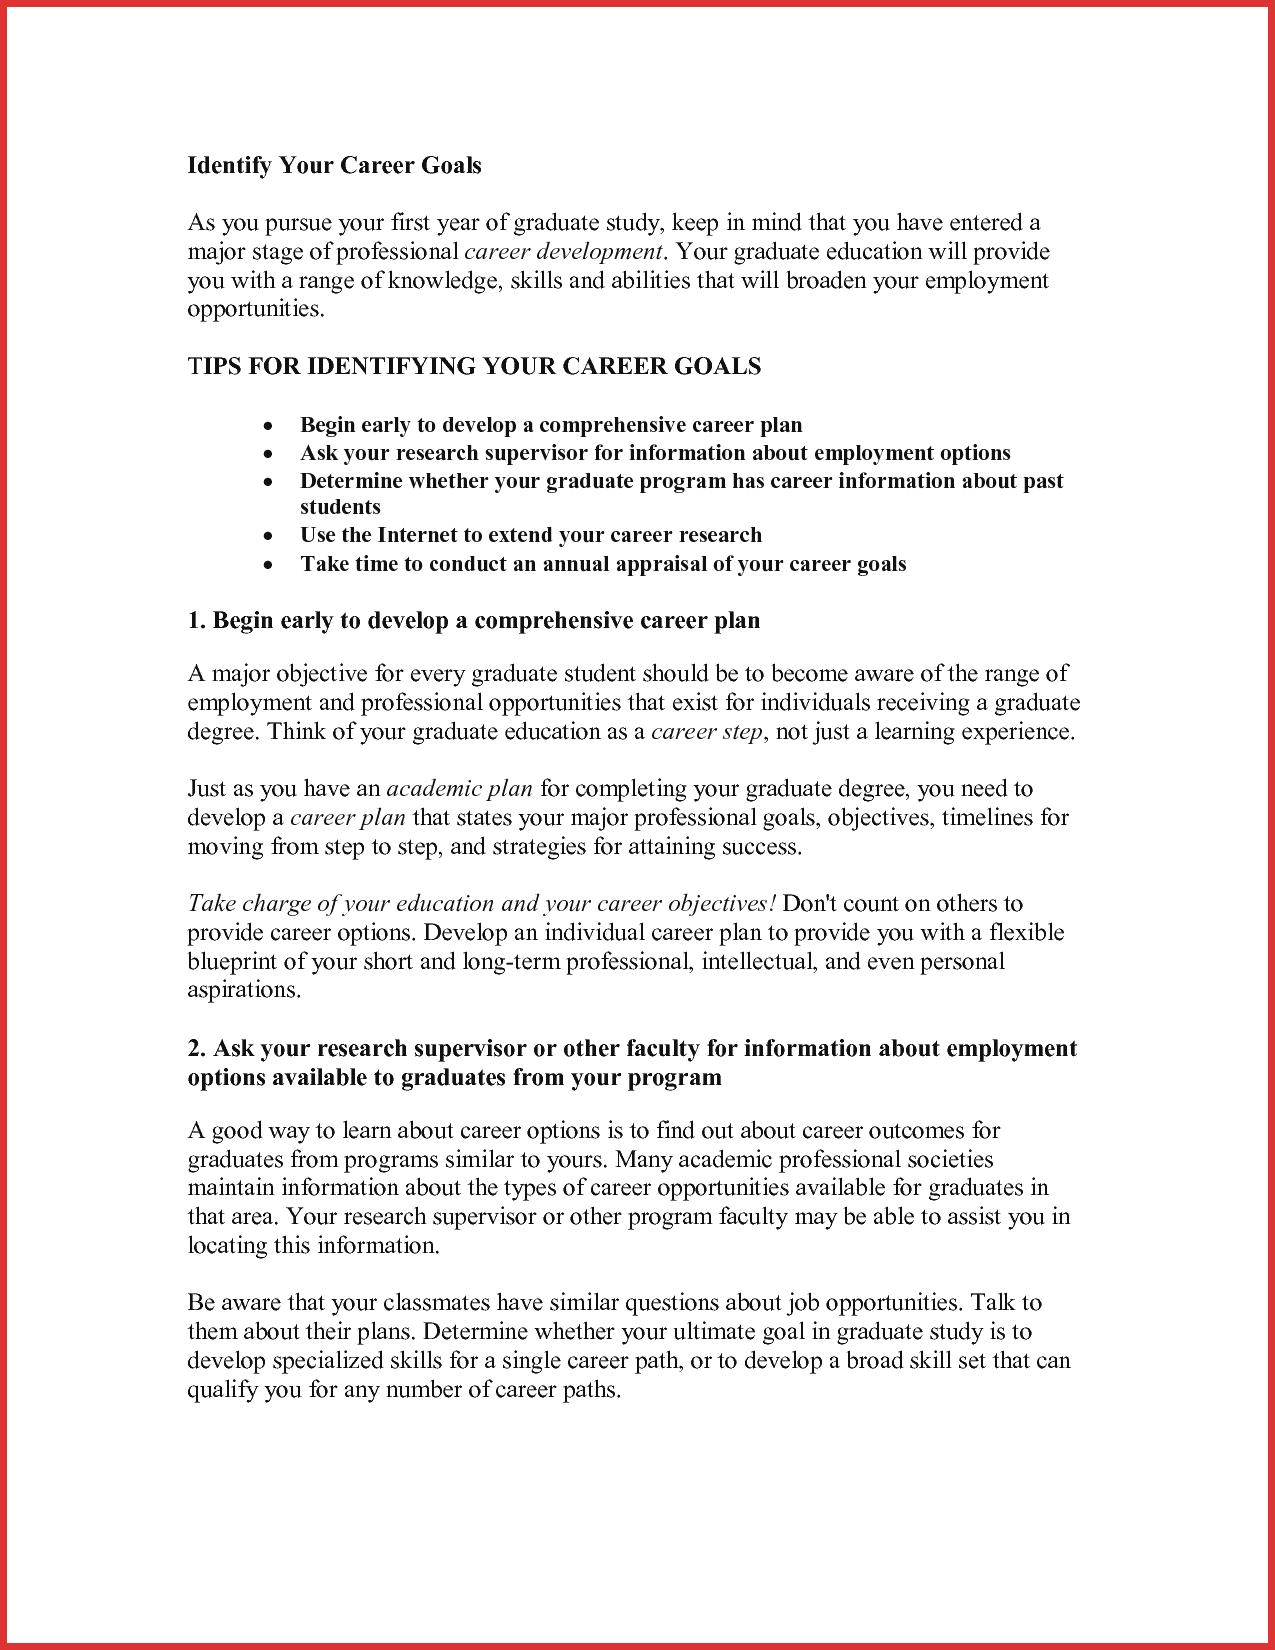 Sample professional goals essay